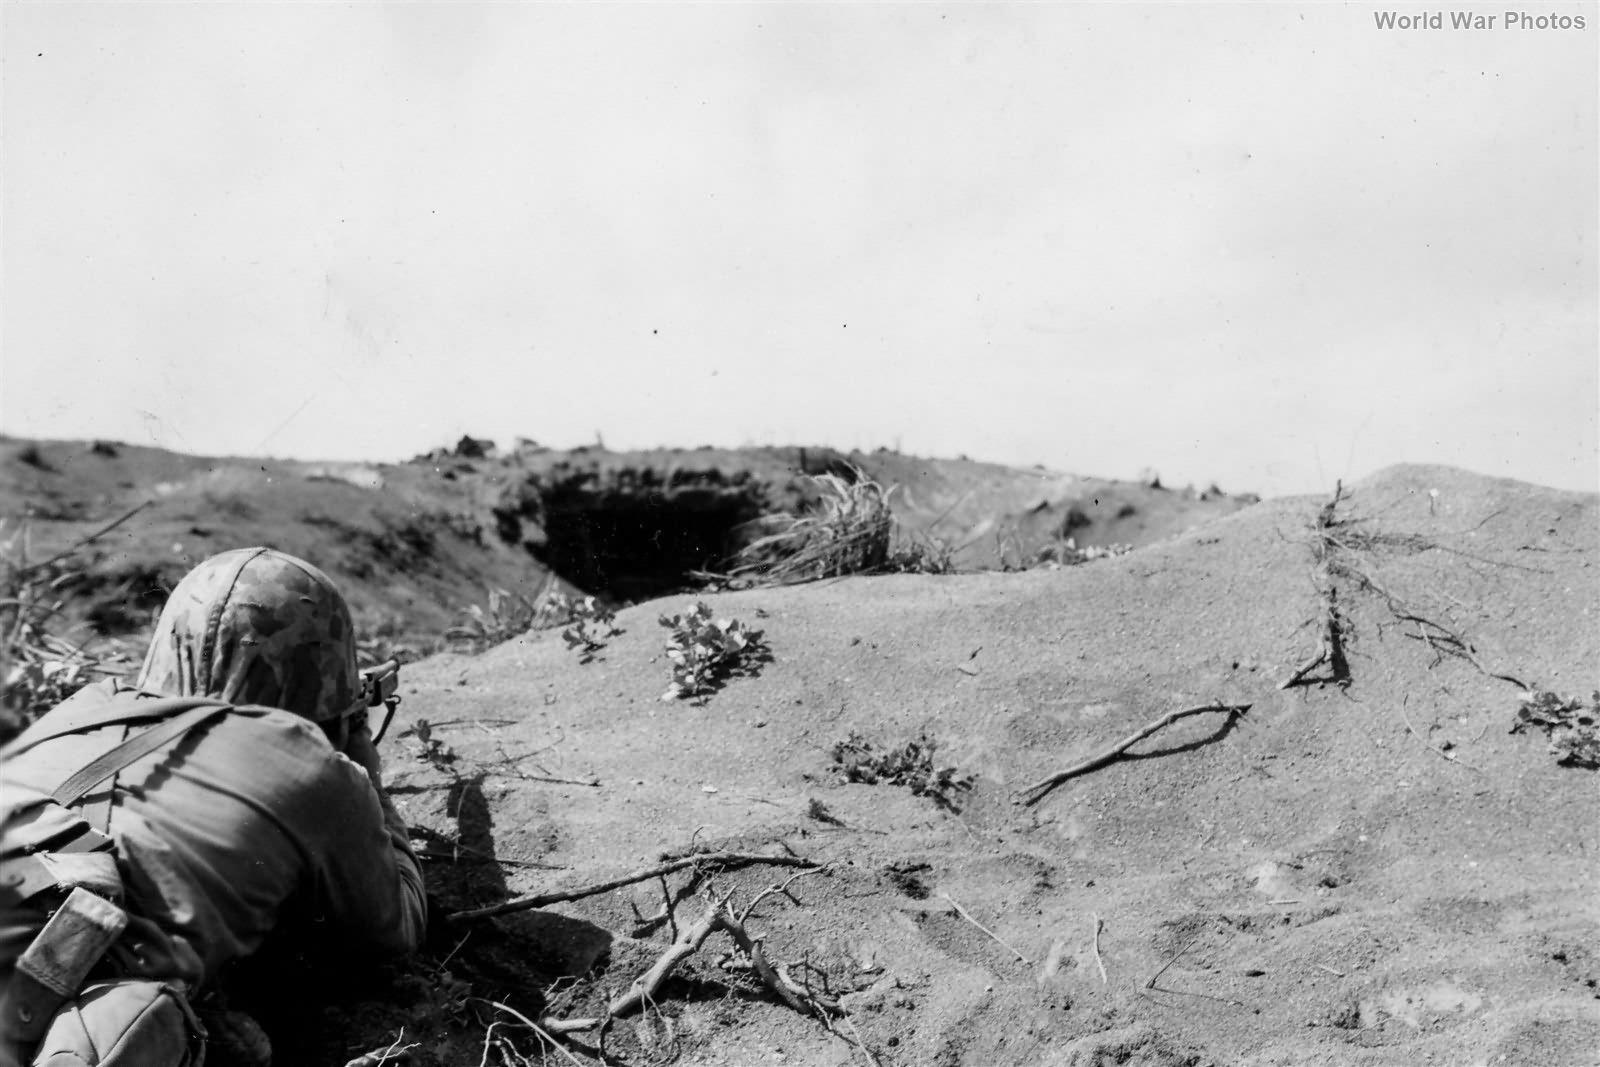 Marine Tommy Gunner covers Japanese Pillbox 1st Day on Iwo Jima 19feb